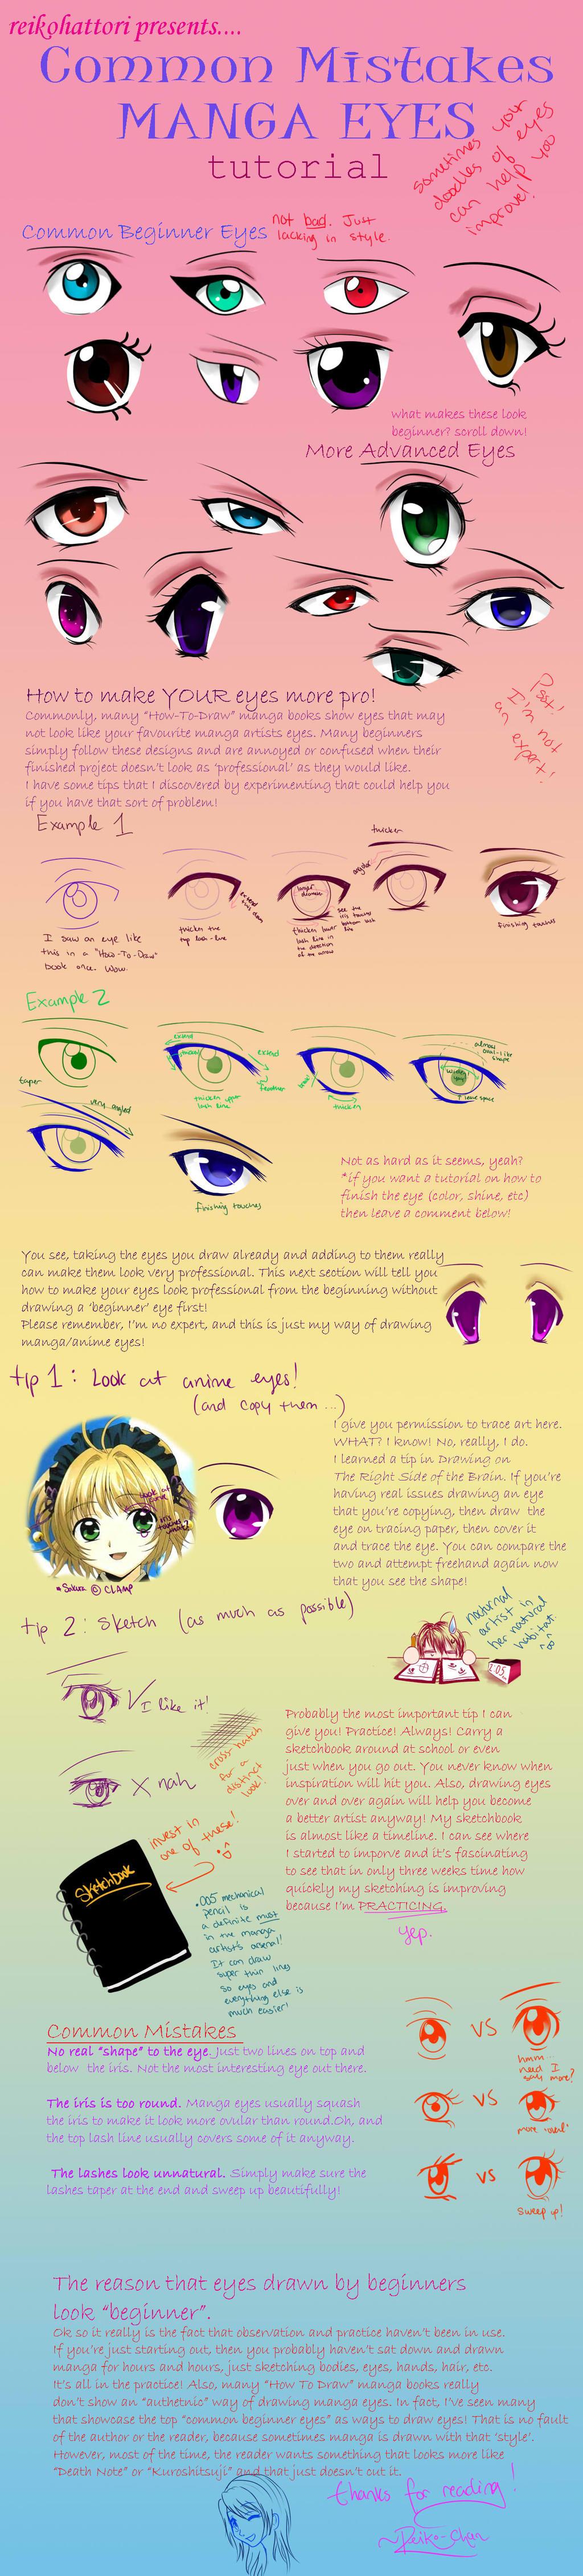 Manga Eye Tutorial For Beginners by reikohattori